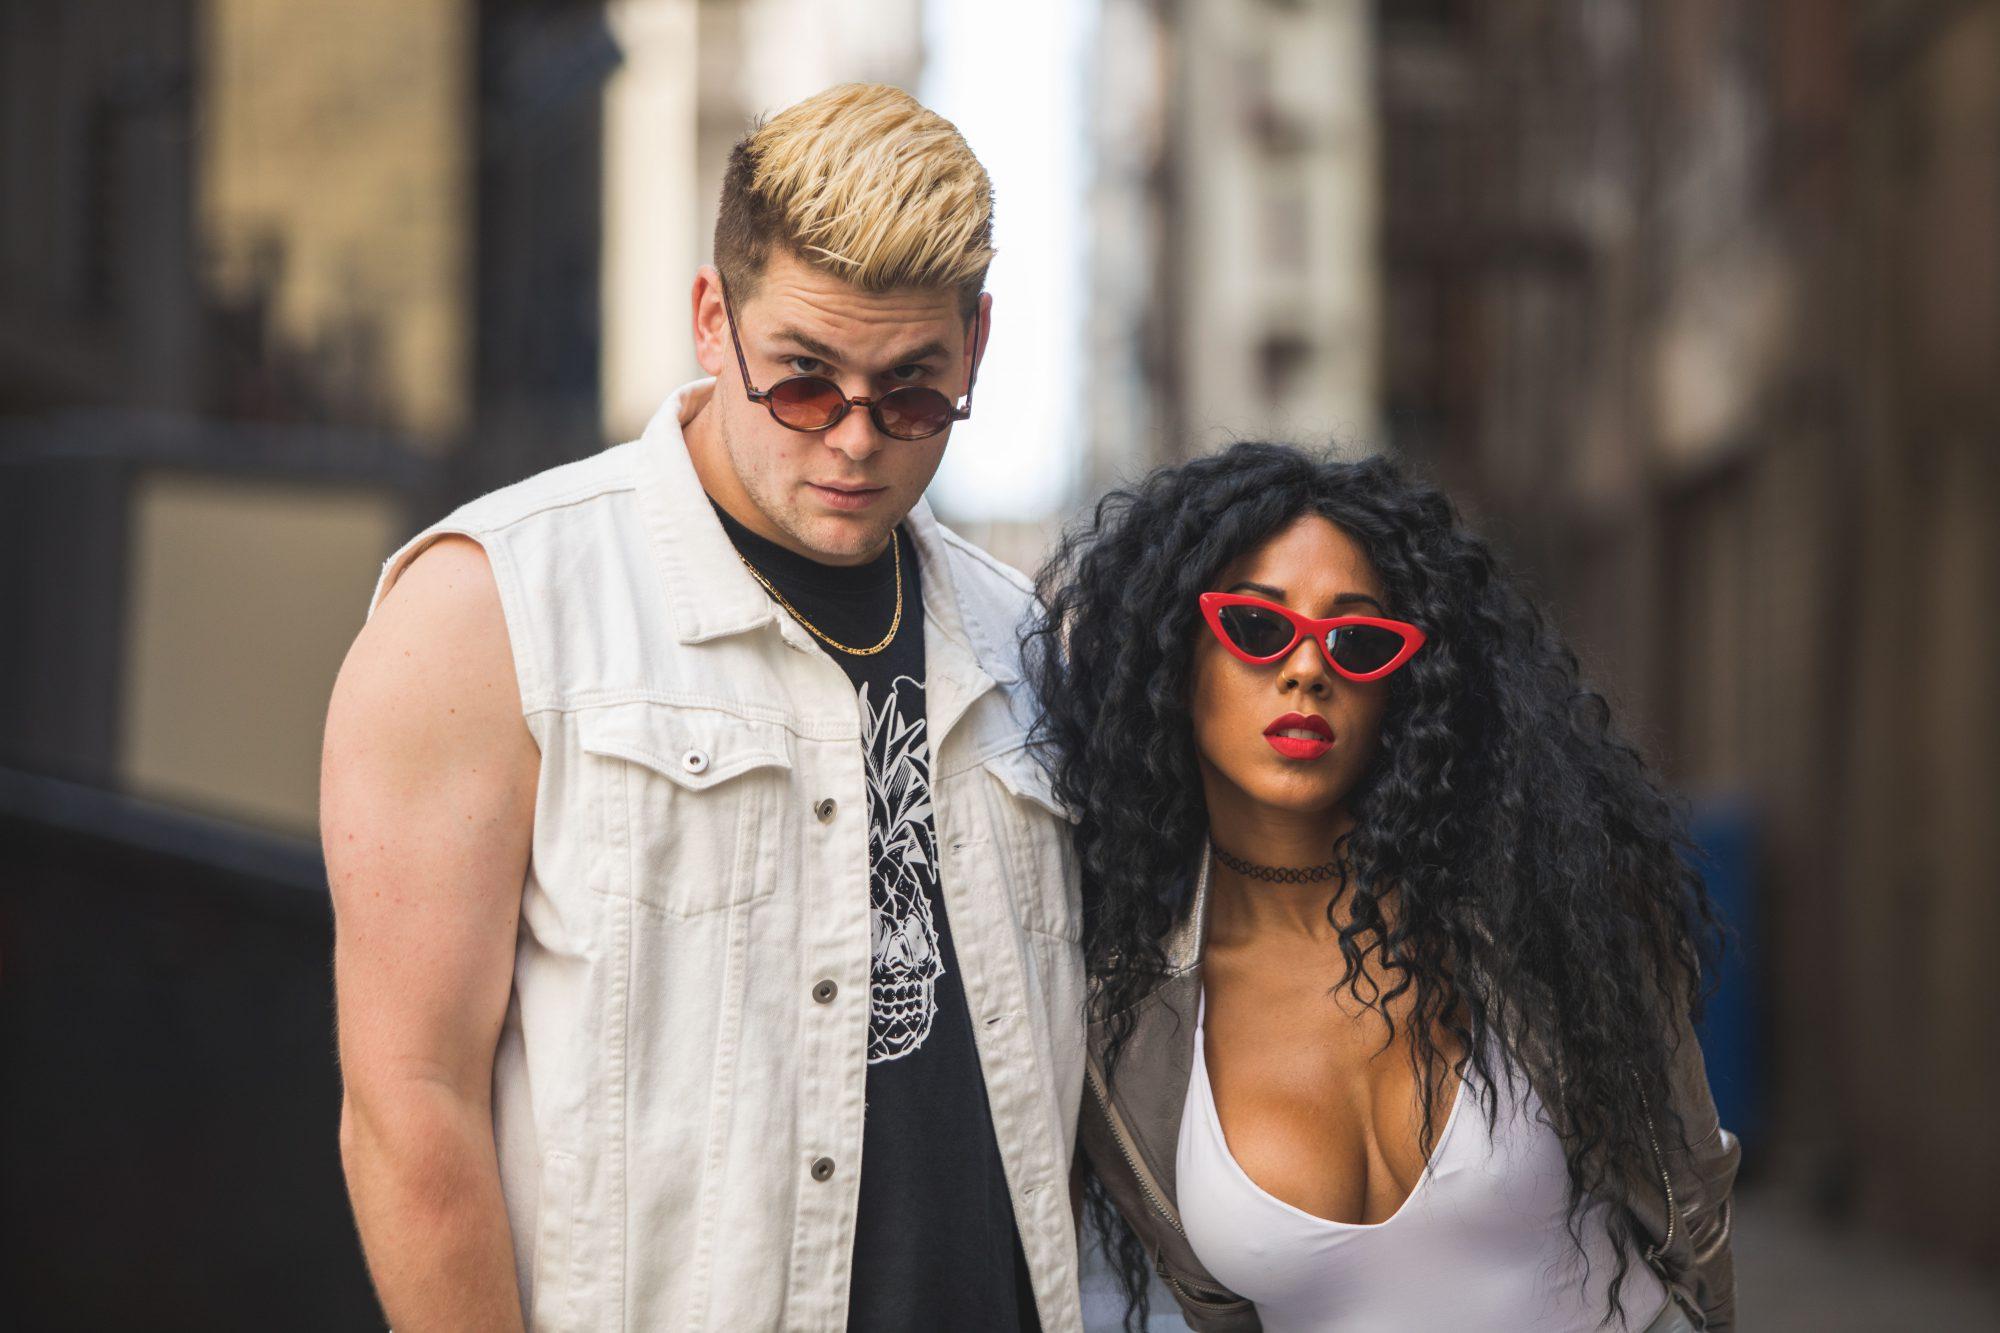 JSTJR Releases Music Video for